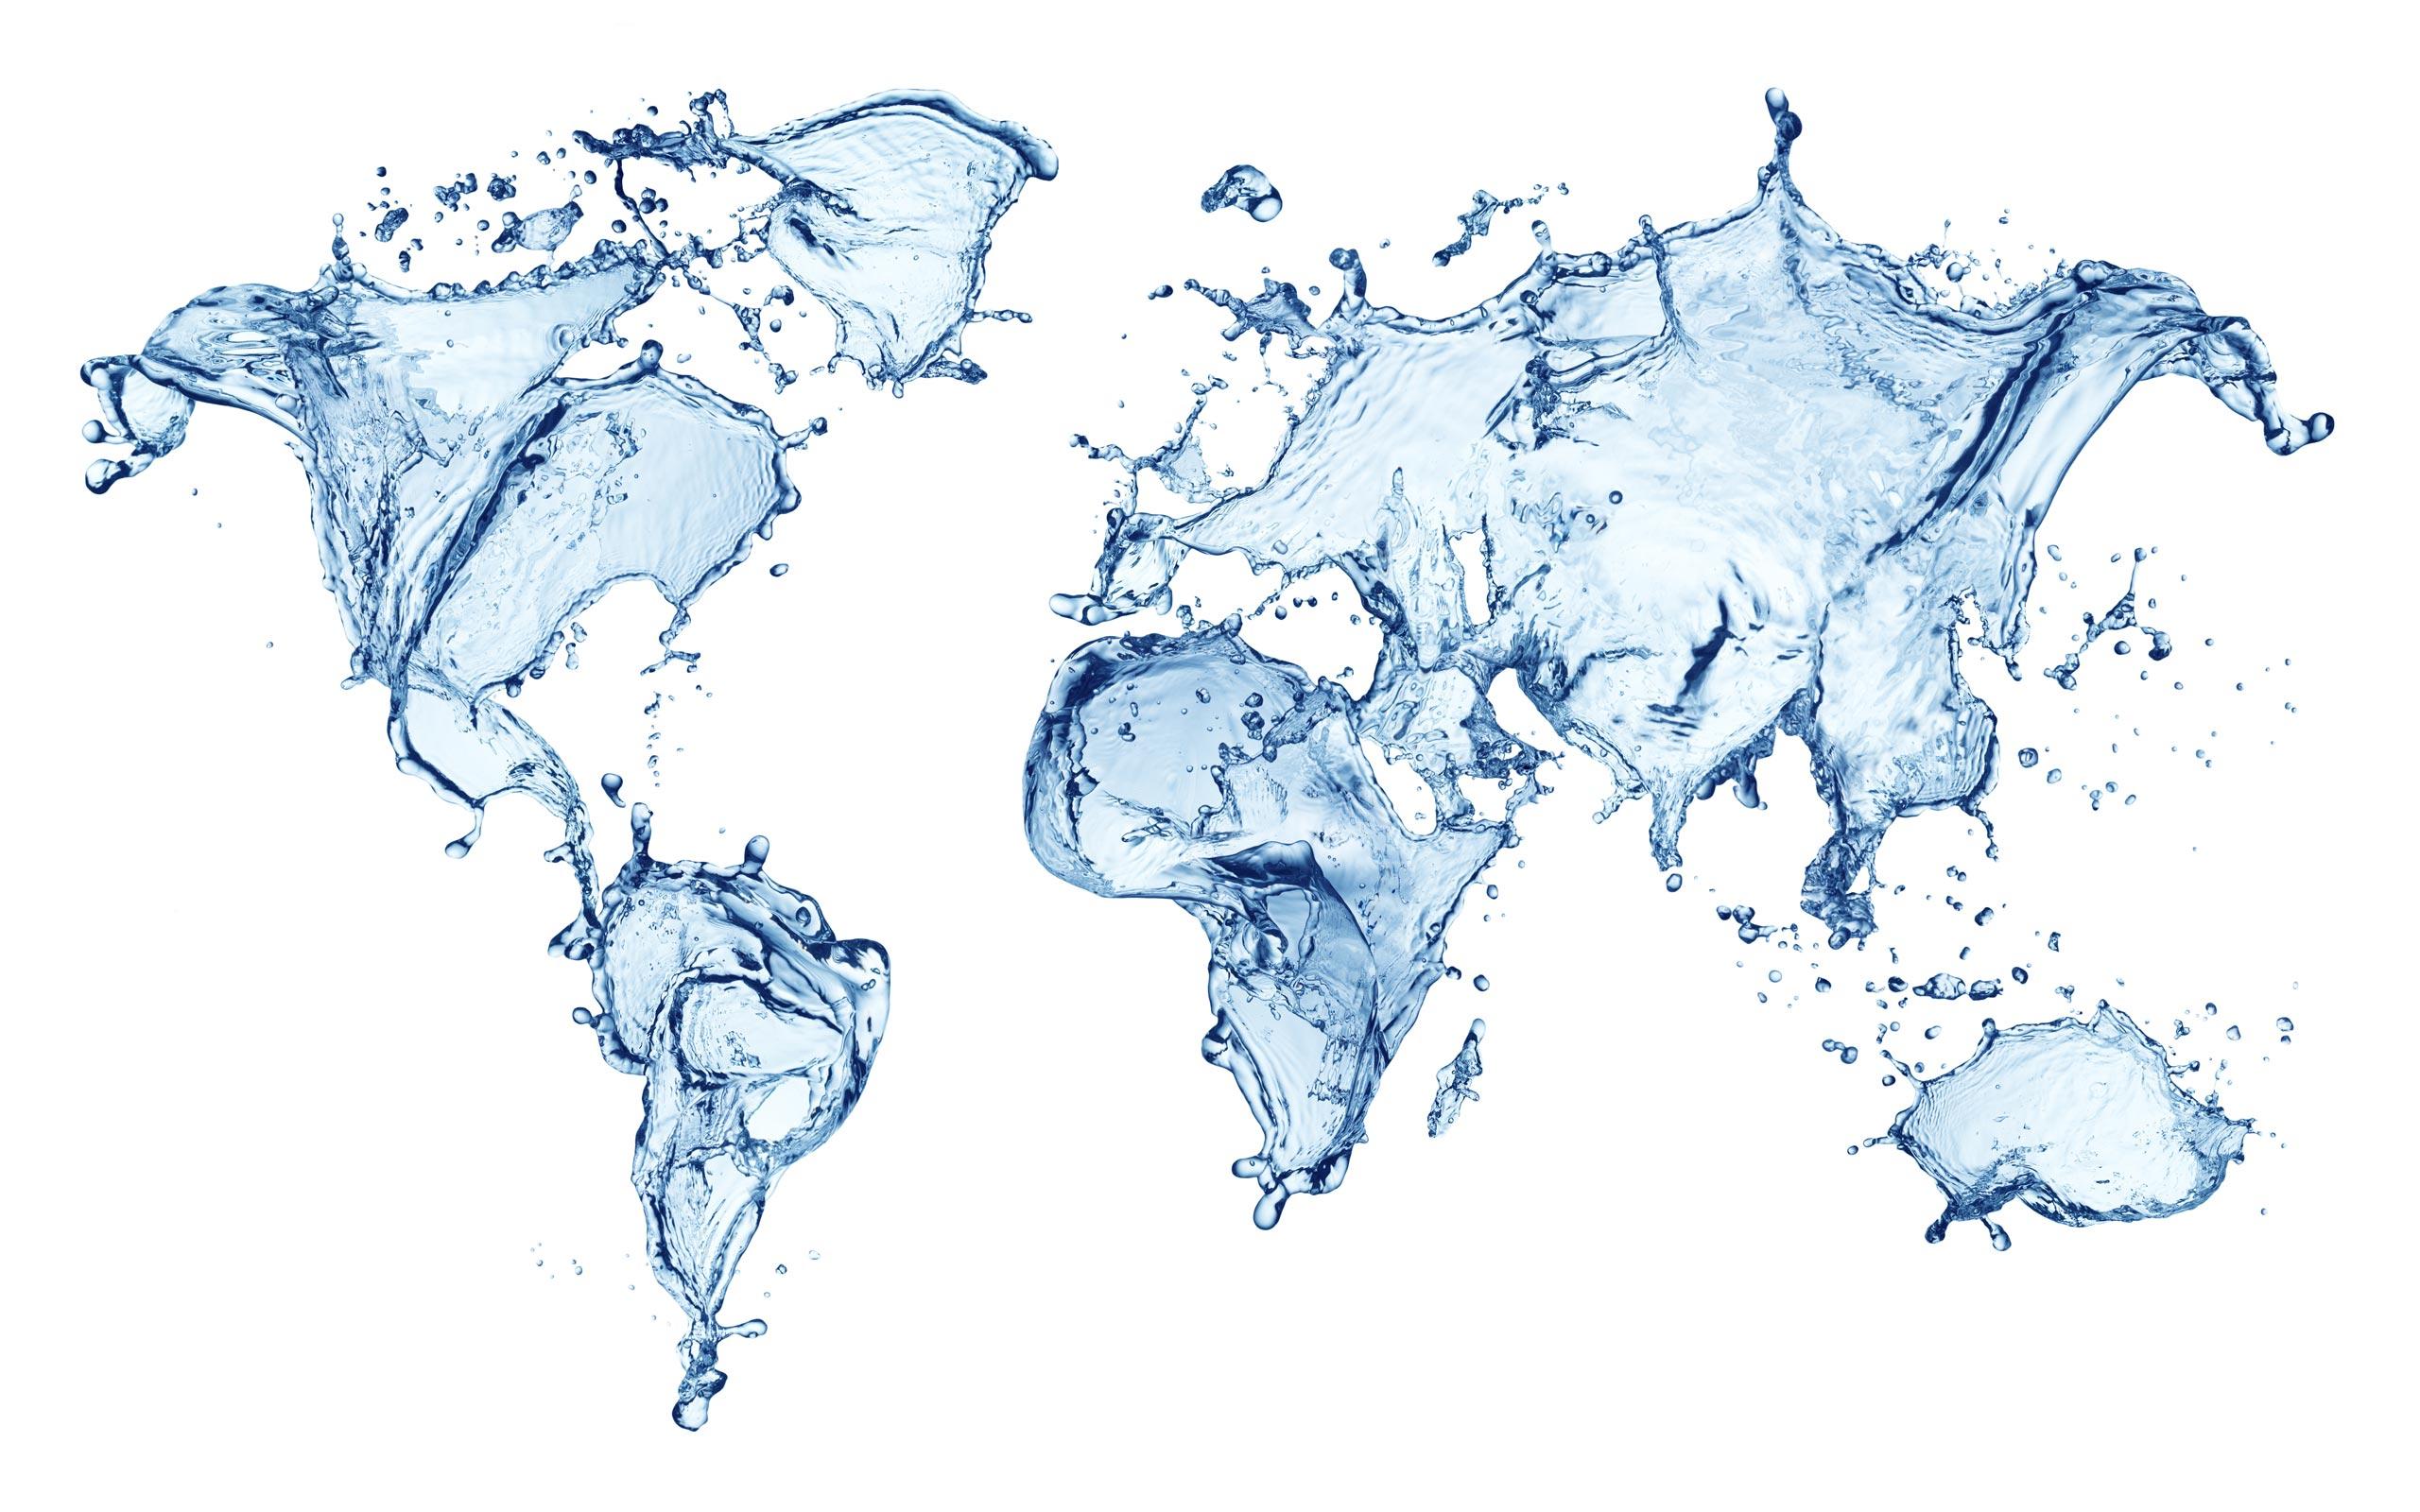 world-map-hd-water-place-com-464624 – Werbeagentur DoMedia